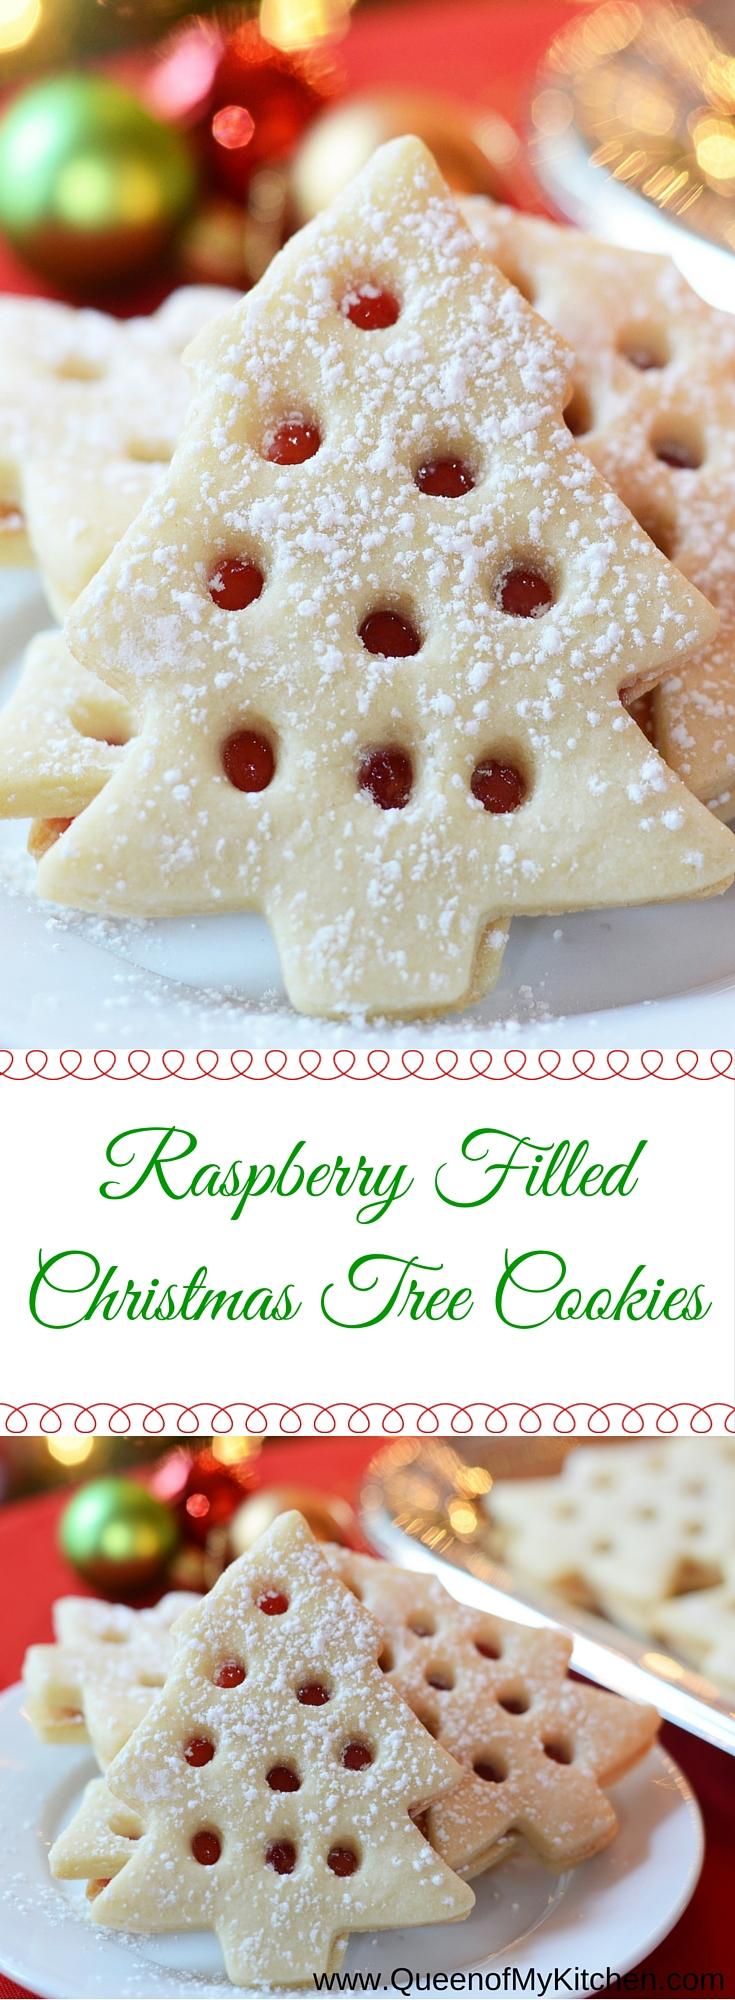 Raspberry Filled Christmas Tree Cookies